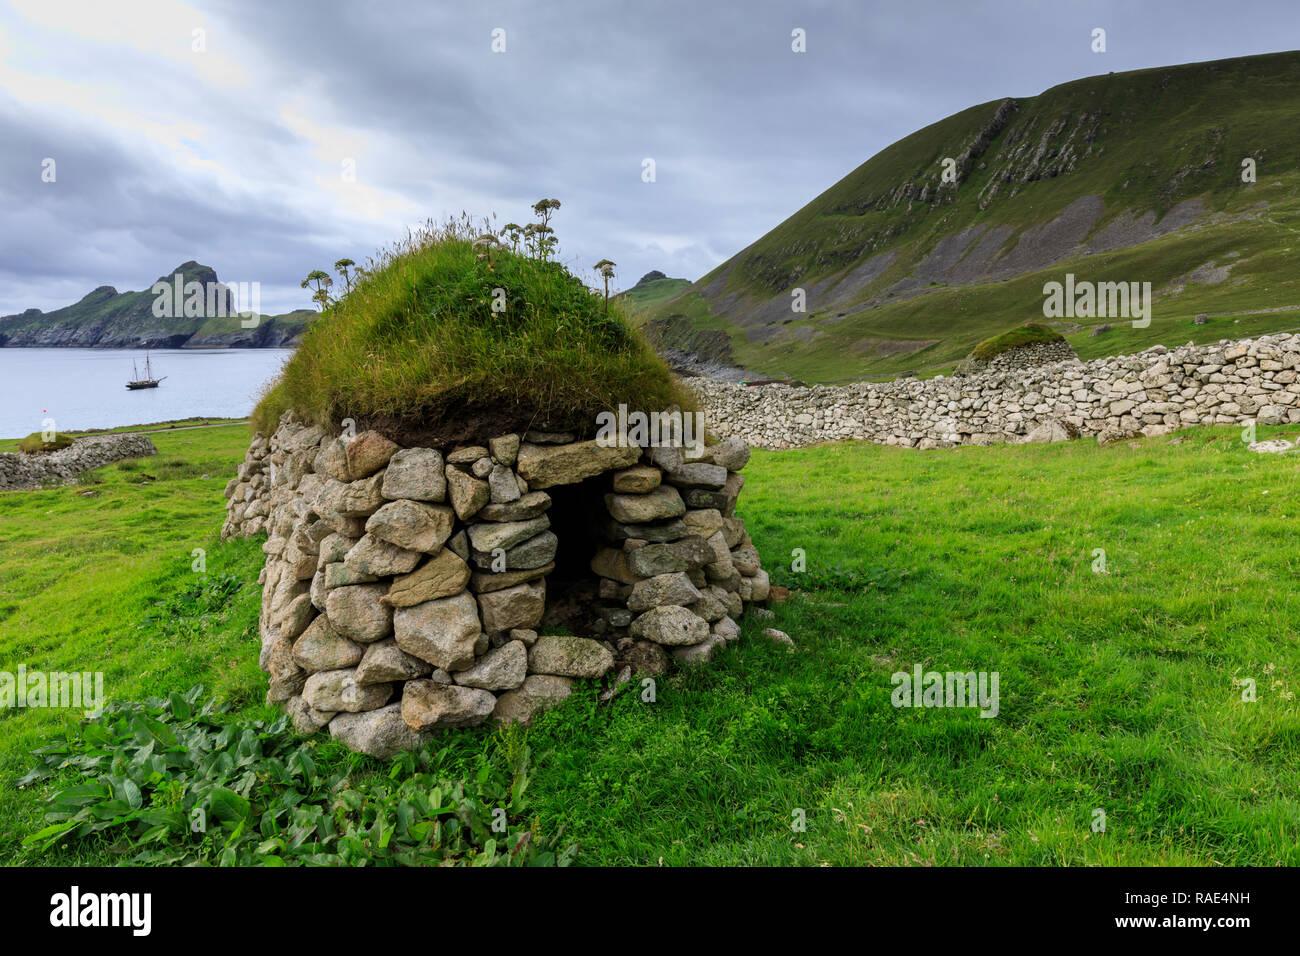 Cleit, food store and Village Bay, evacuated village, Hirta, remote St, Kilda Archipelago, UNESCO, Outer Hebrides, Scotland, United Kingdom - Stock Image